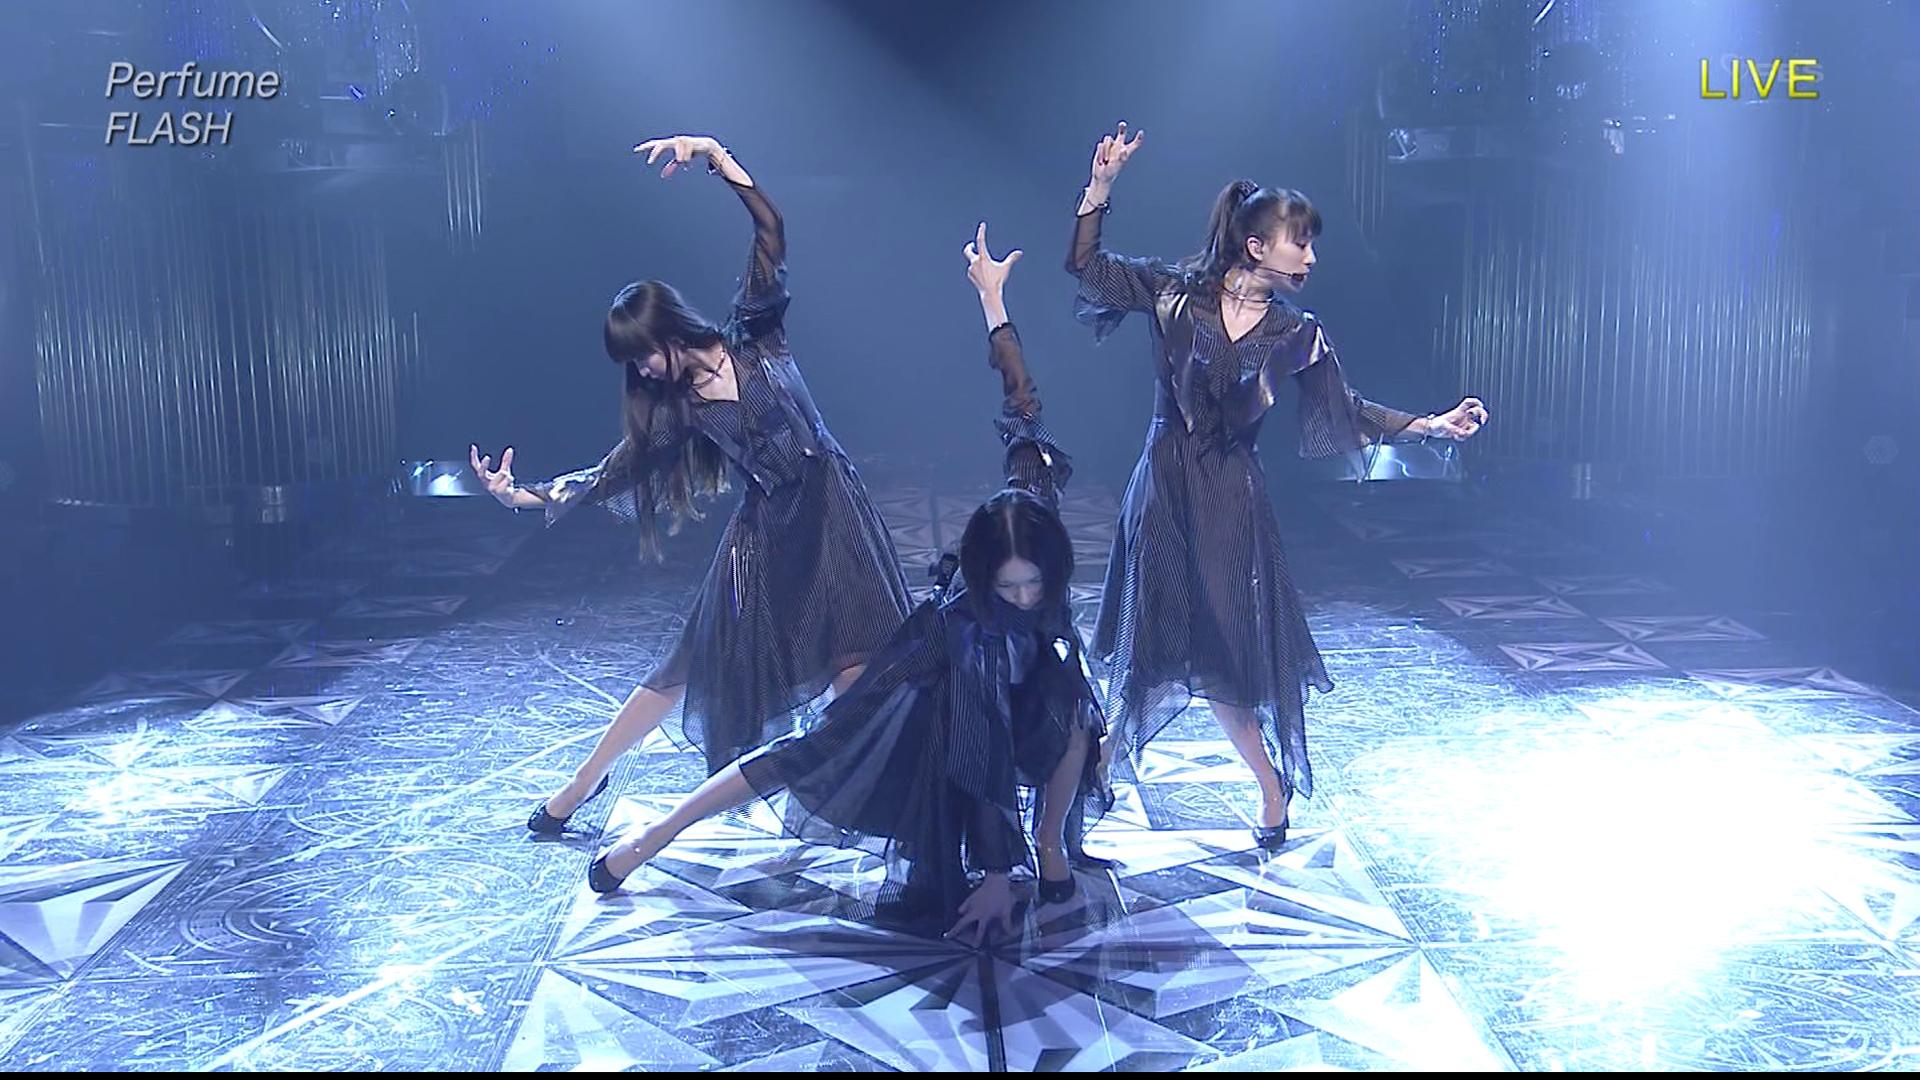 20170403.0228.1 Perfume - Flash (NTV Best Artist 2016.11.29) (JPOP.ru).jpg